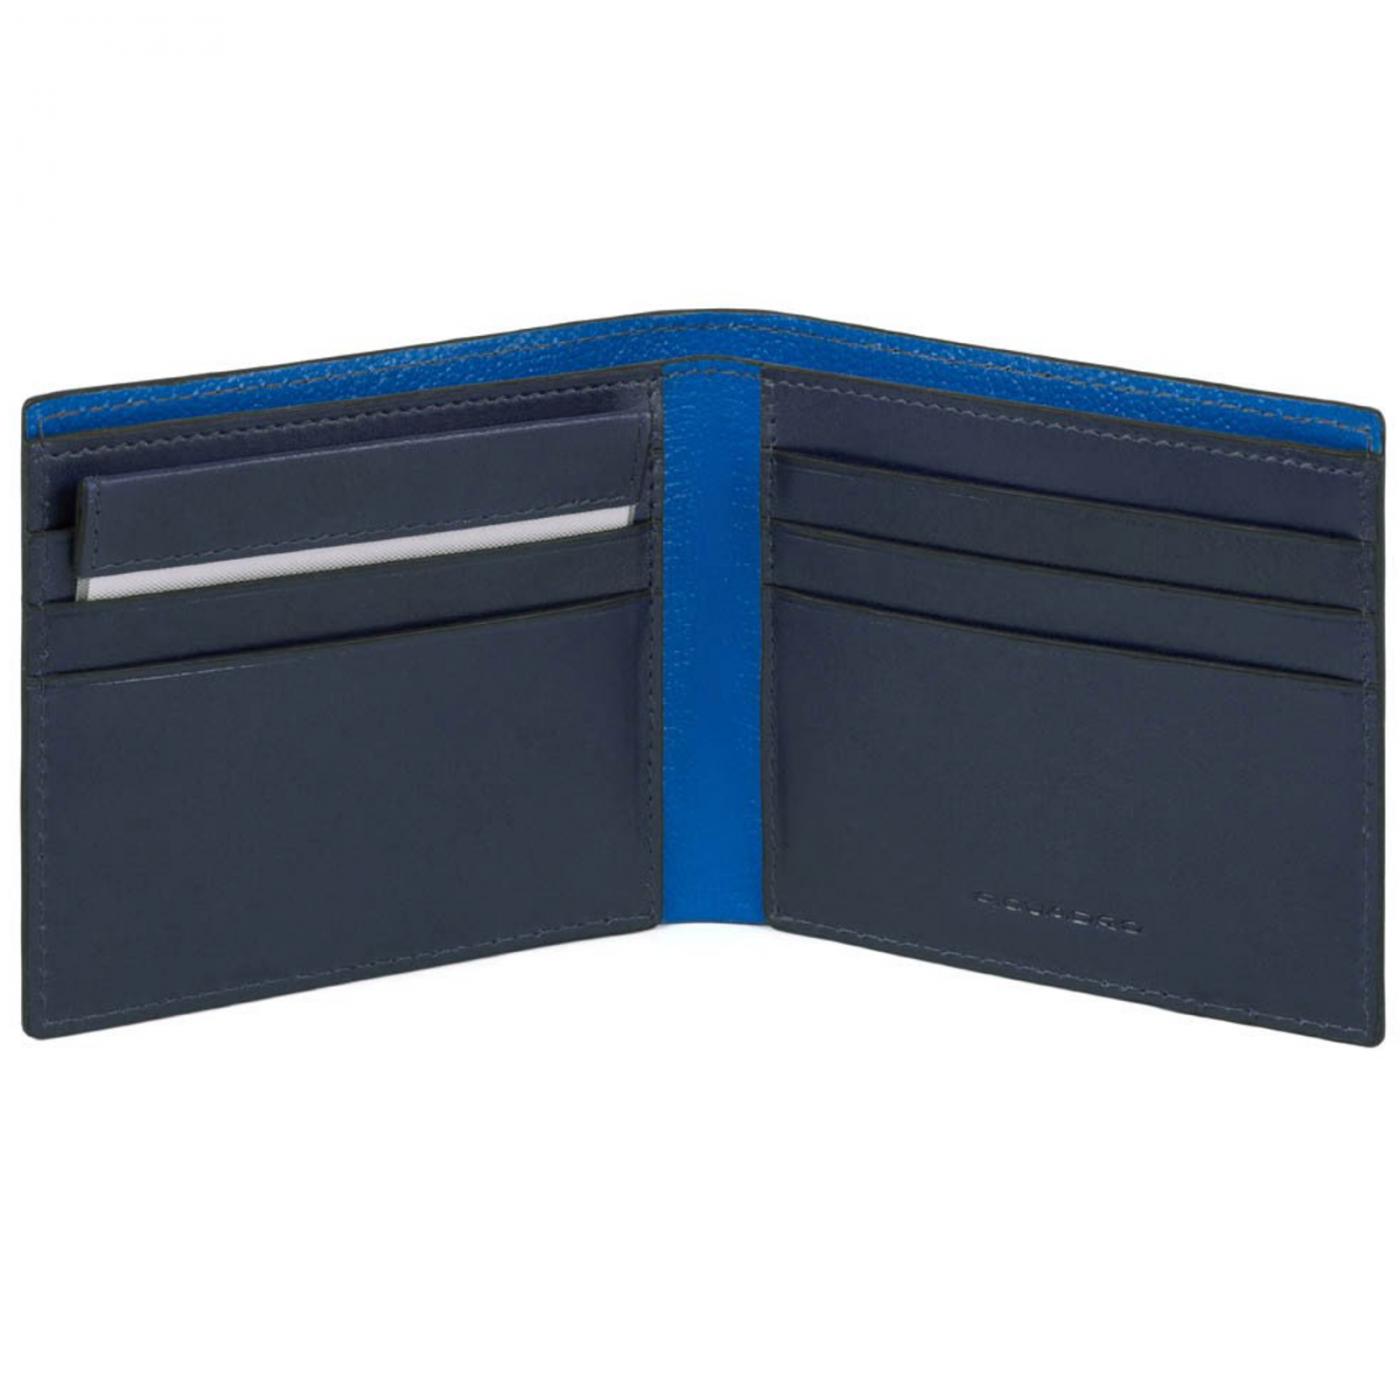 PIQUADRO Bold portafogli uomo 6 cc, RFID, pelle blu